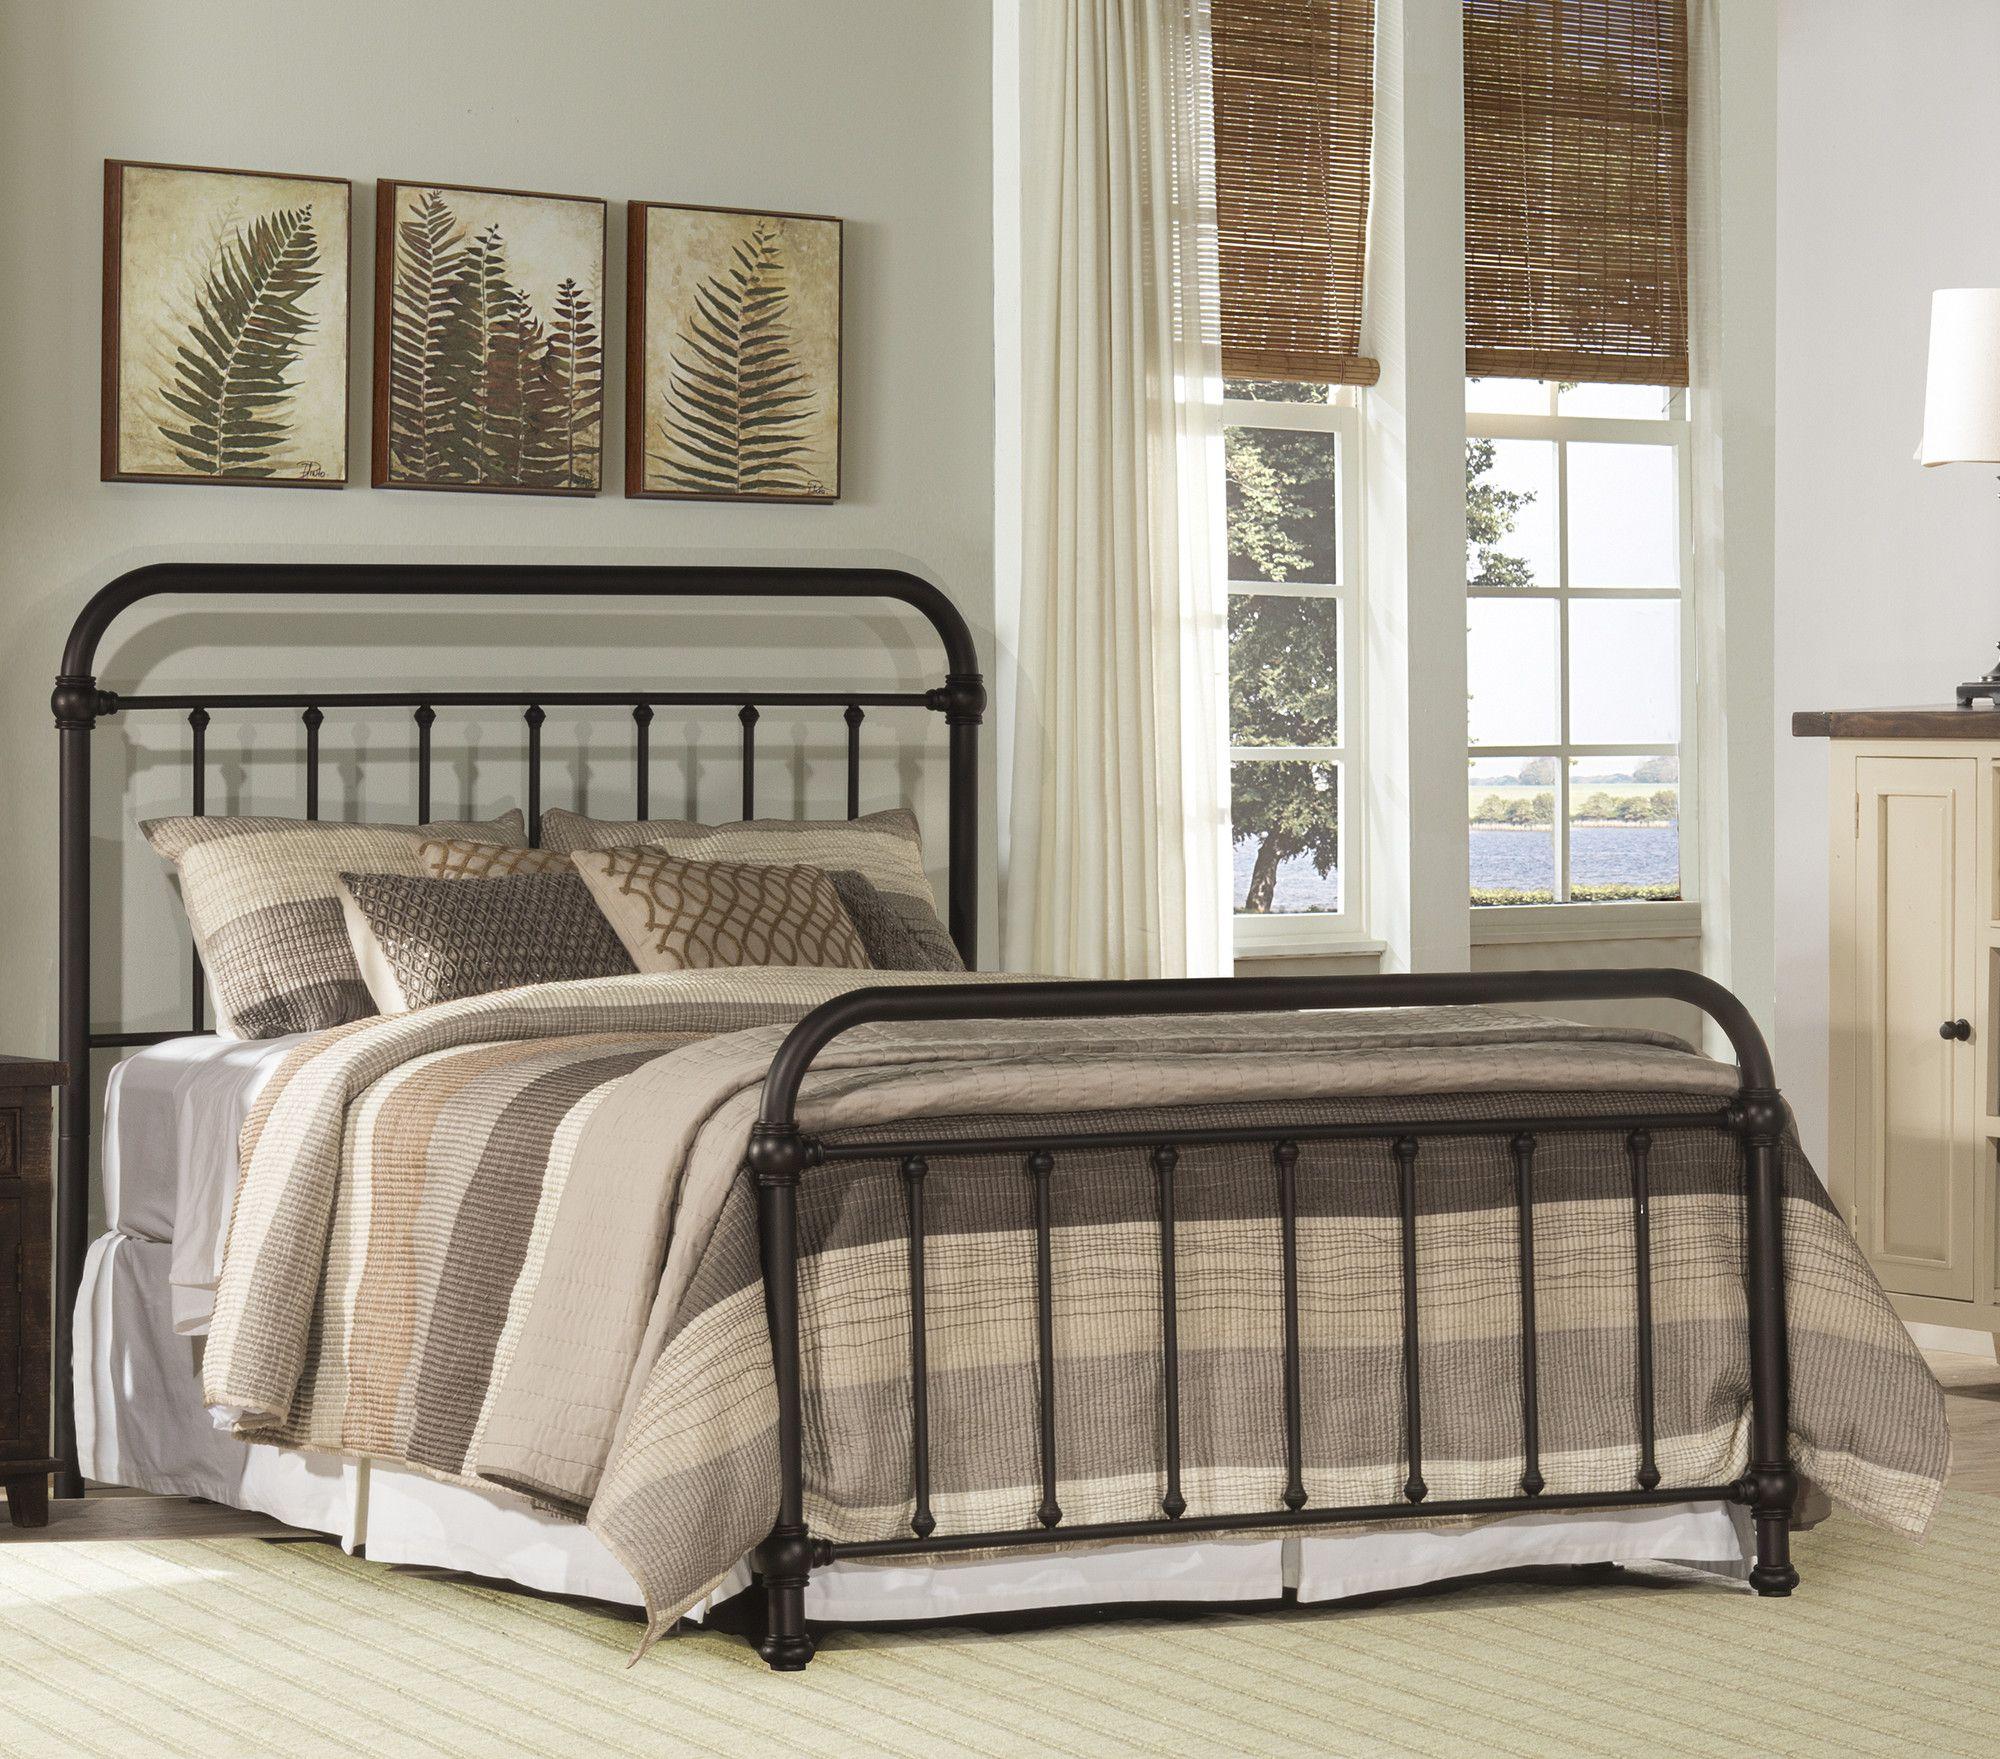 Hallie Slat Headboard Hillsdale furniture, Panel bed